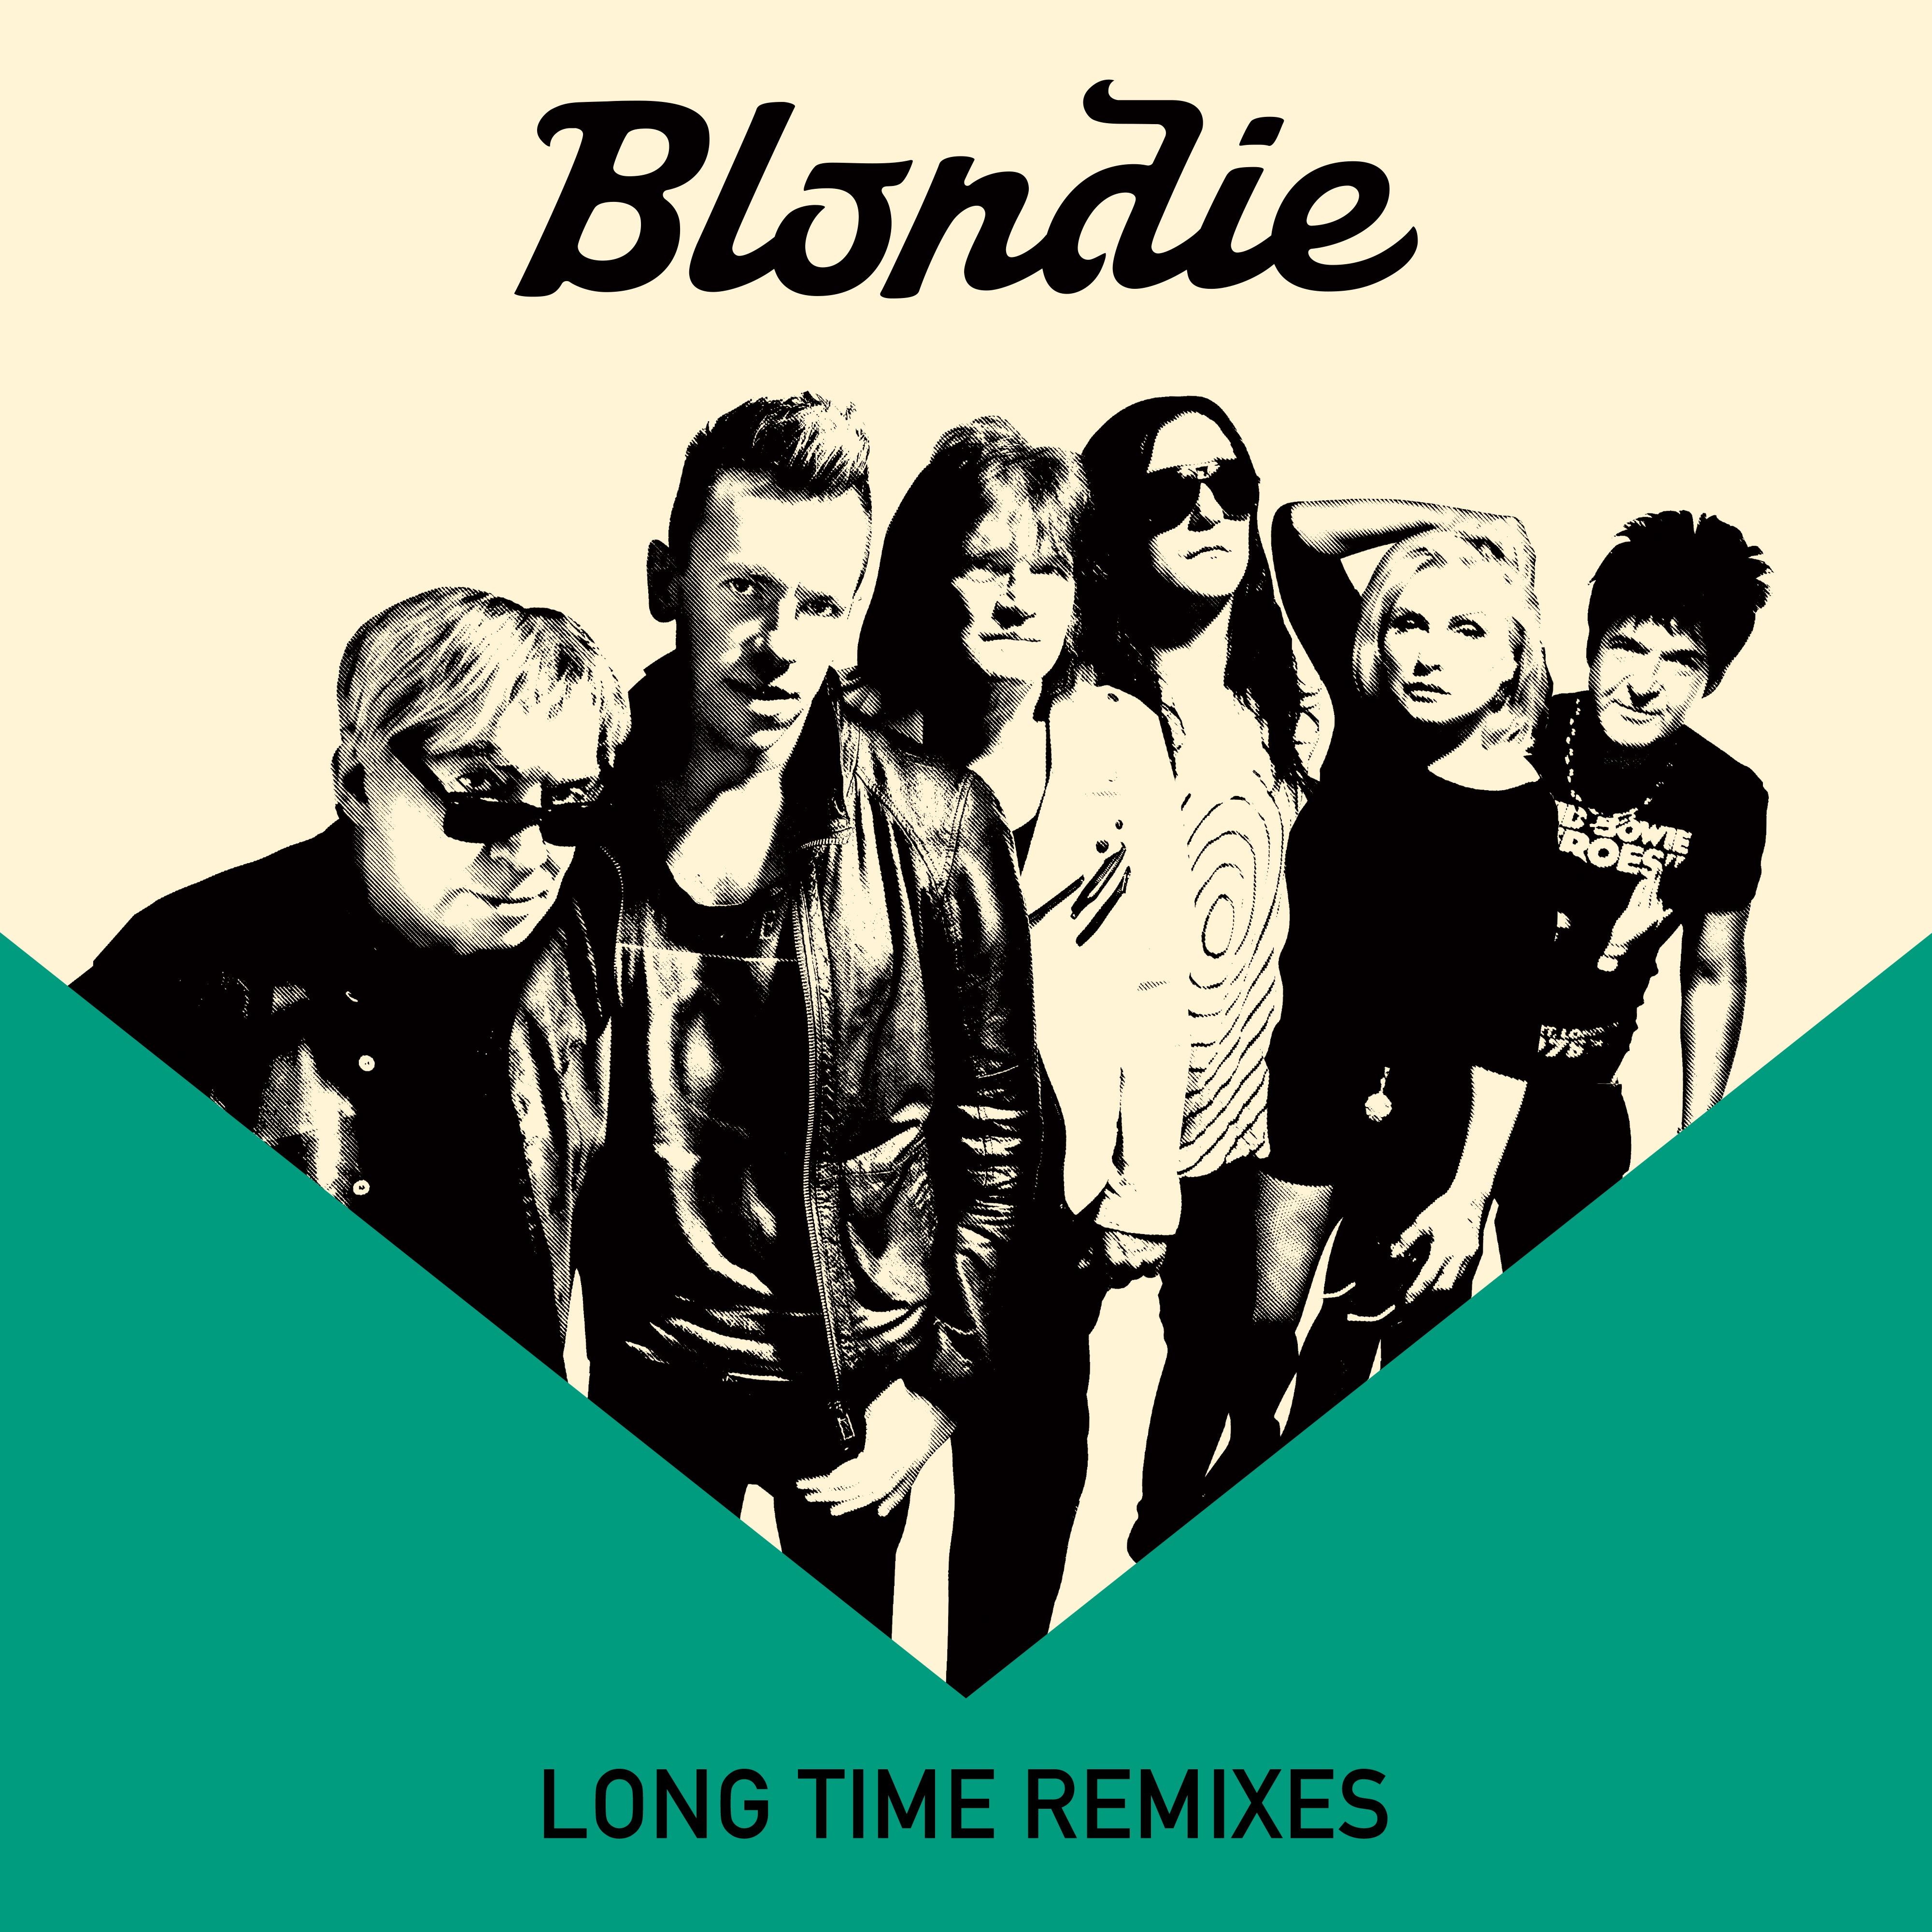 long_time_remixes_1.jpg